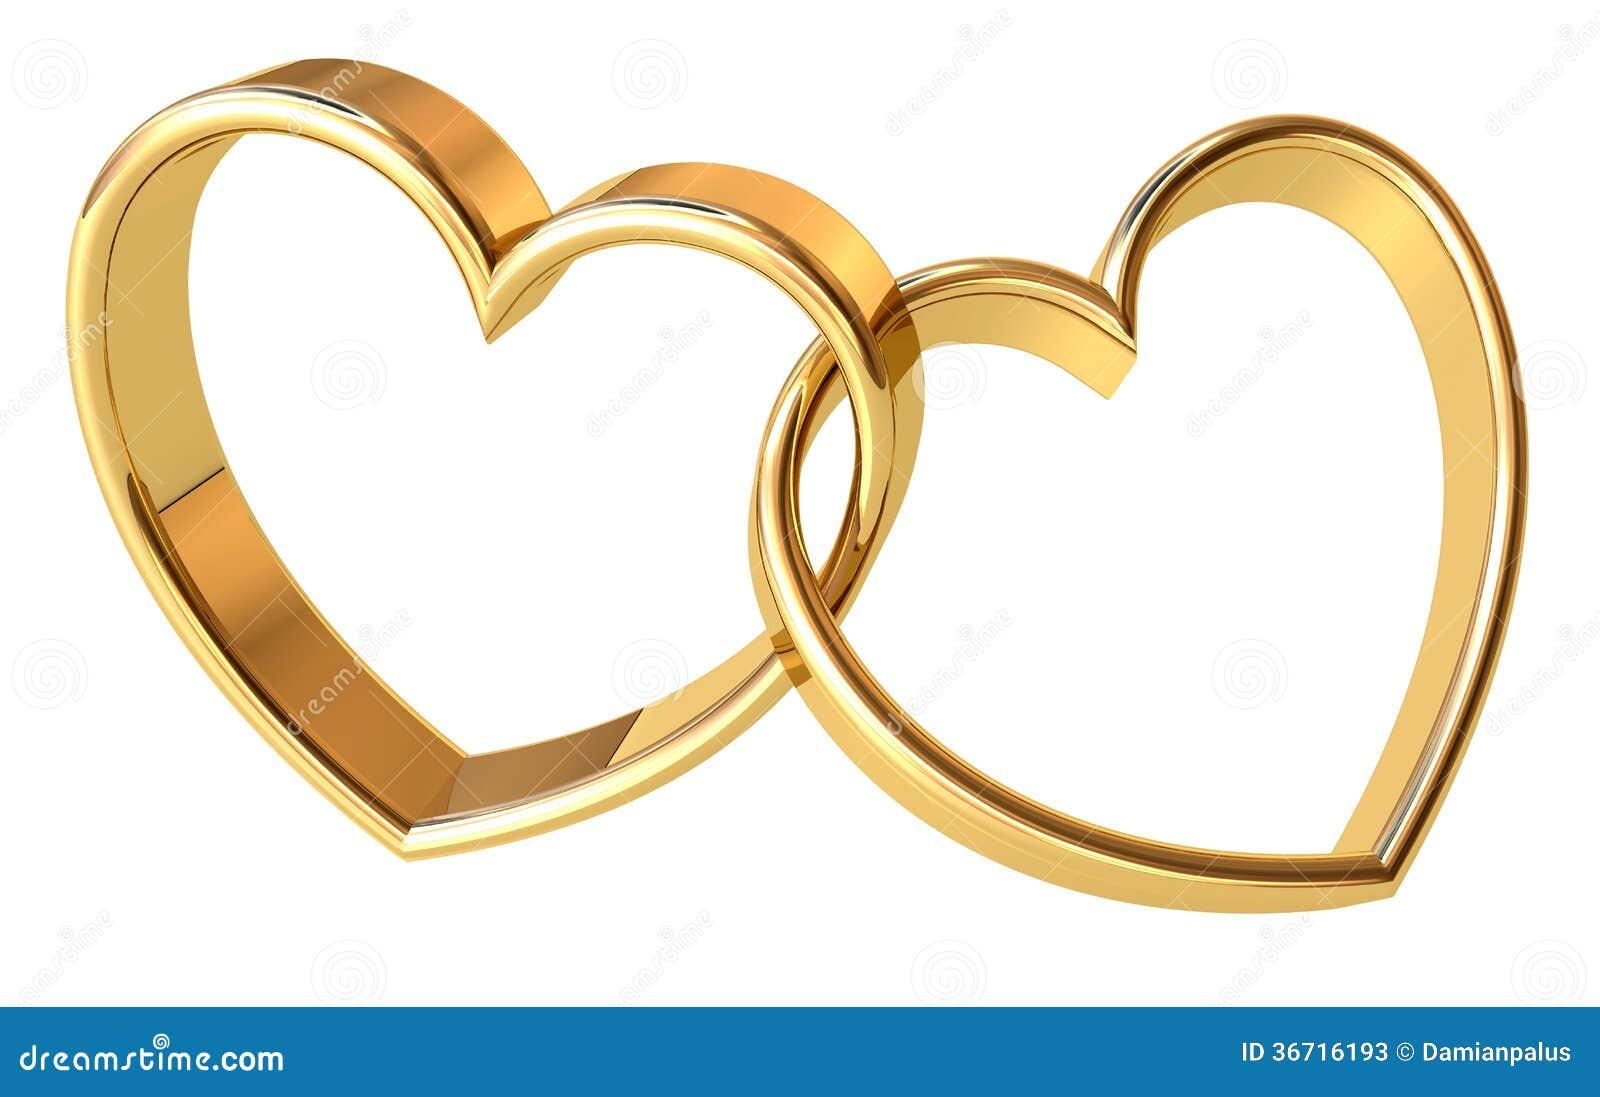 Valentines golden hearts background. Power of Love.